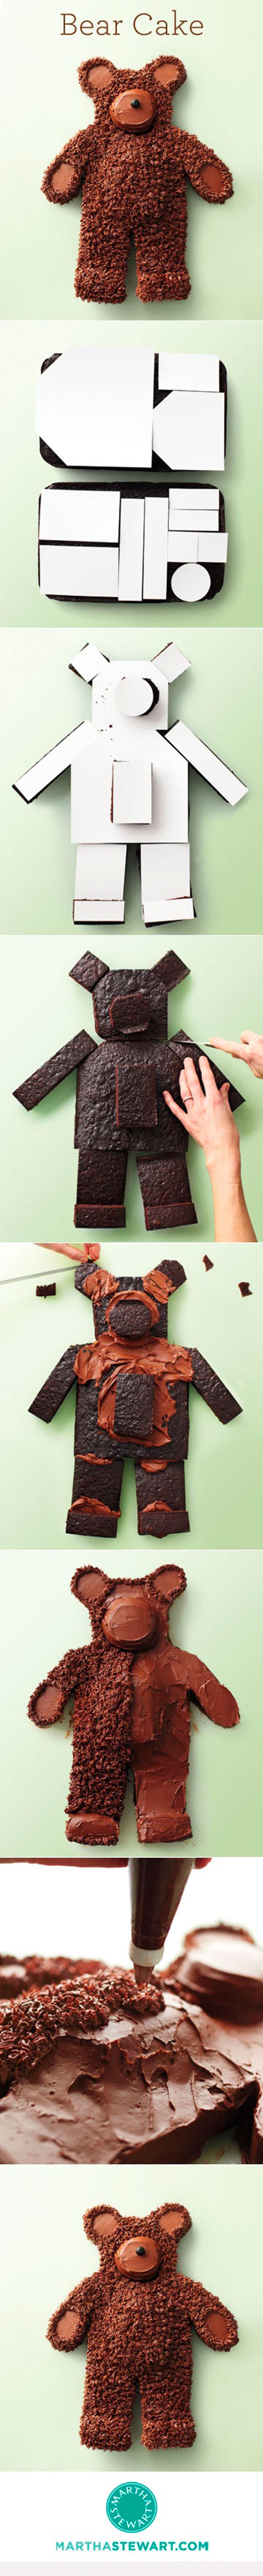 Montar bolo infantil 9